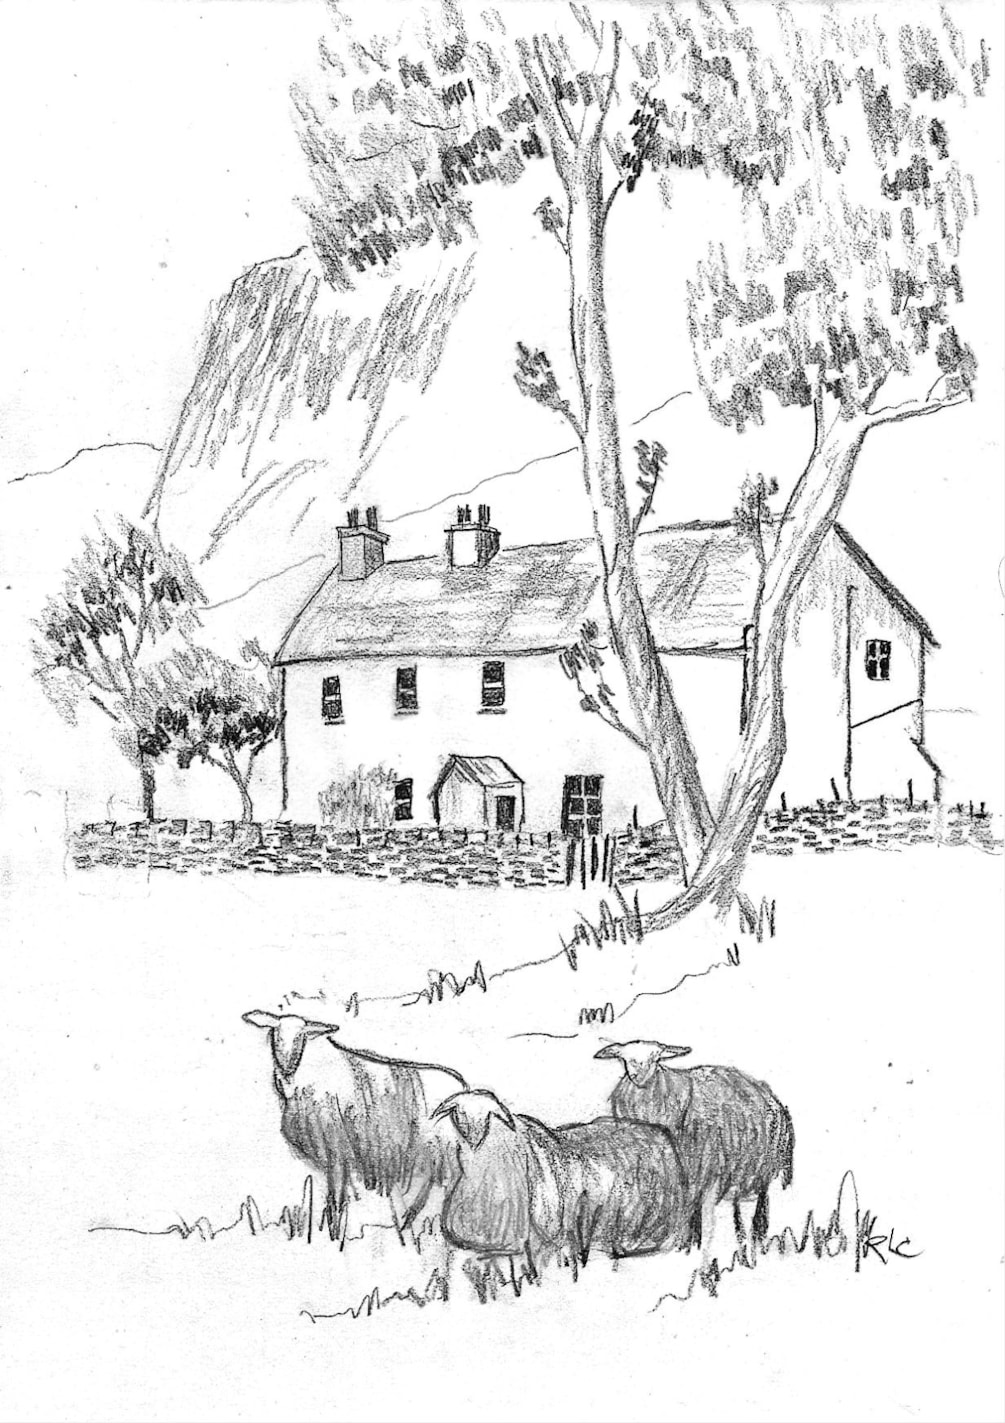 Stonethwaite (Again)